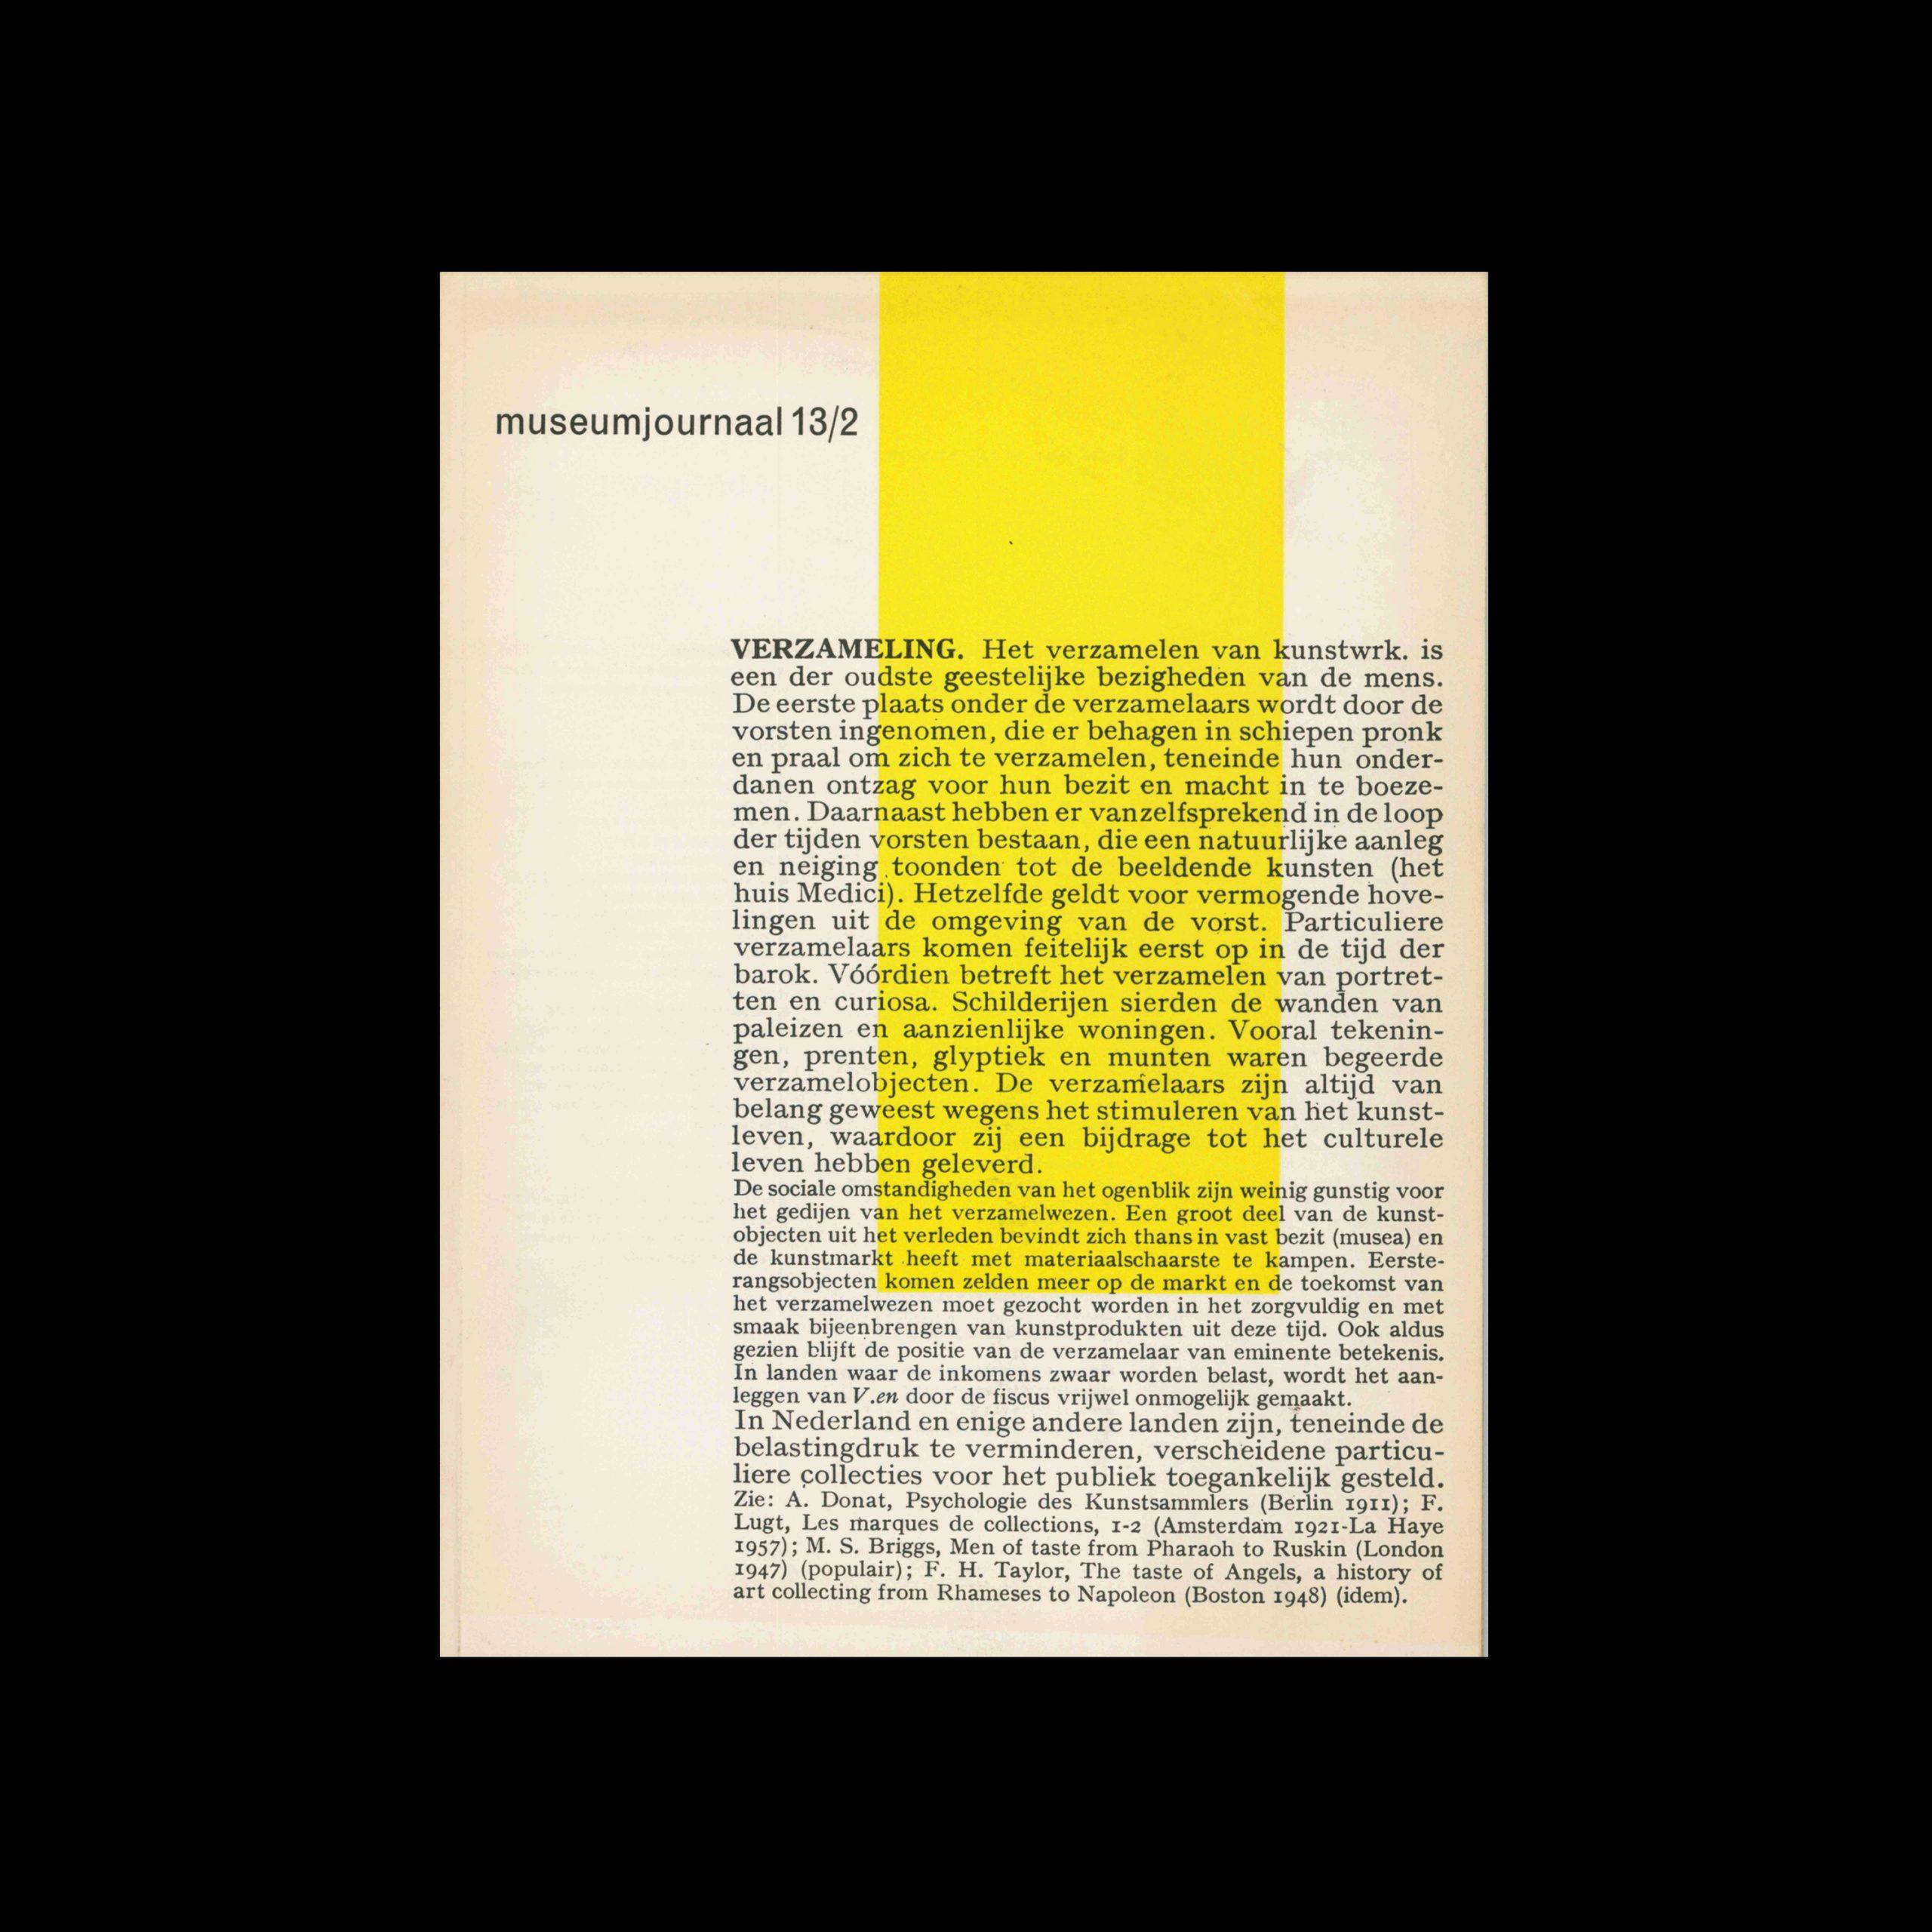 Museumjournaal, Serie 13 no2, 1968. Designed by Jurriaan Schrofer.